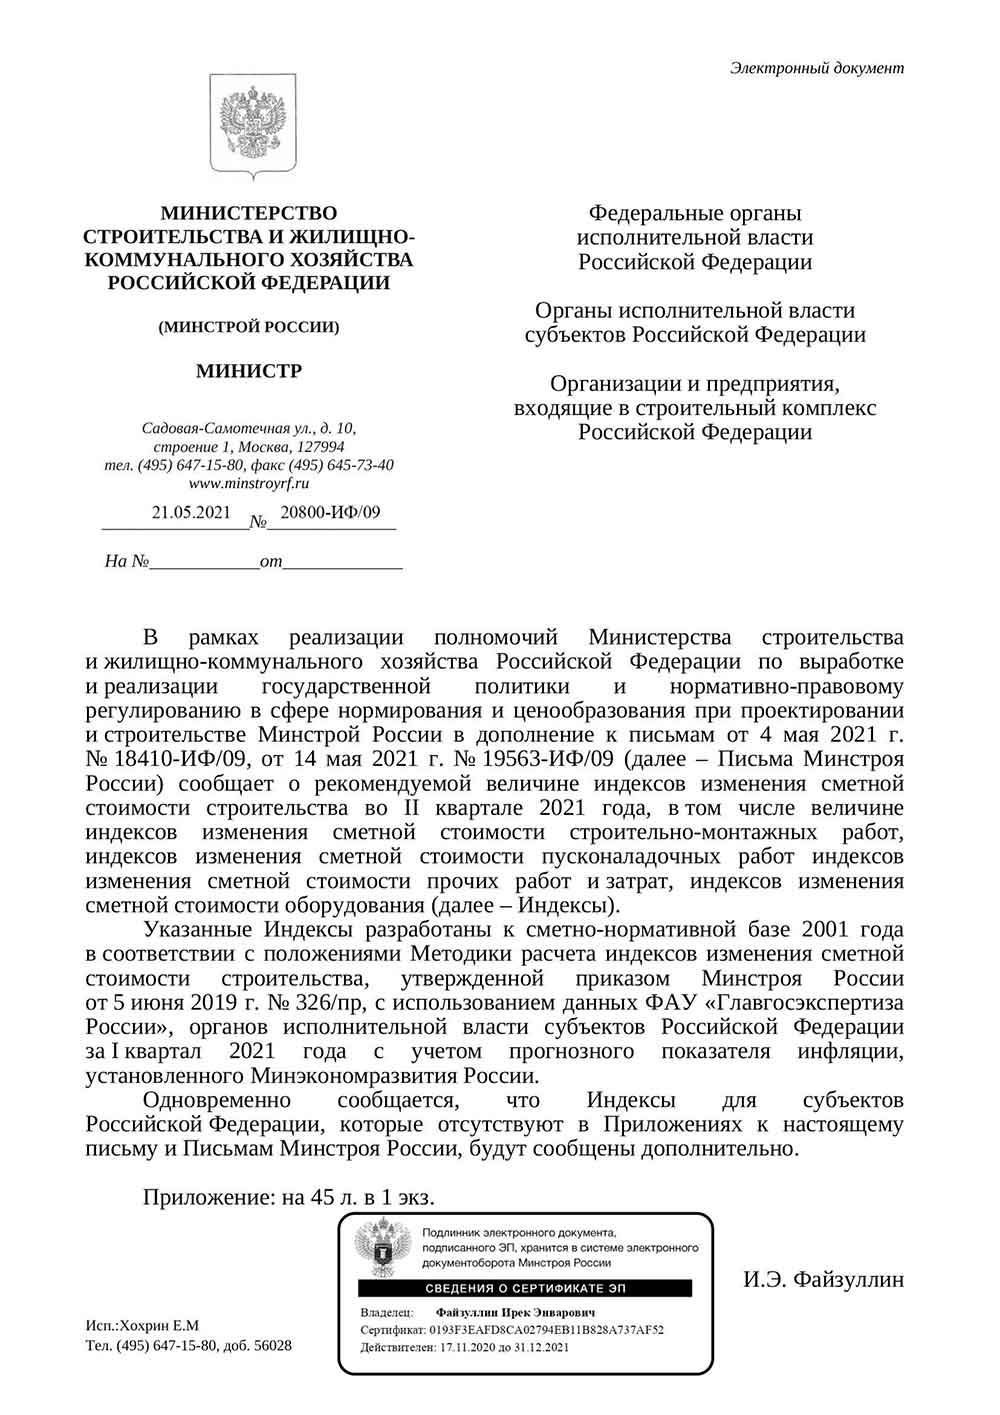 Письмо Минстроя РФ №20800-ИФ/09 от 21.05.2021 г.